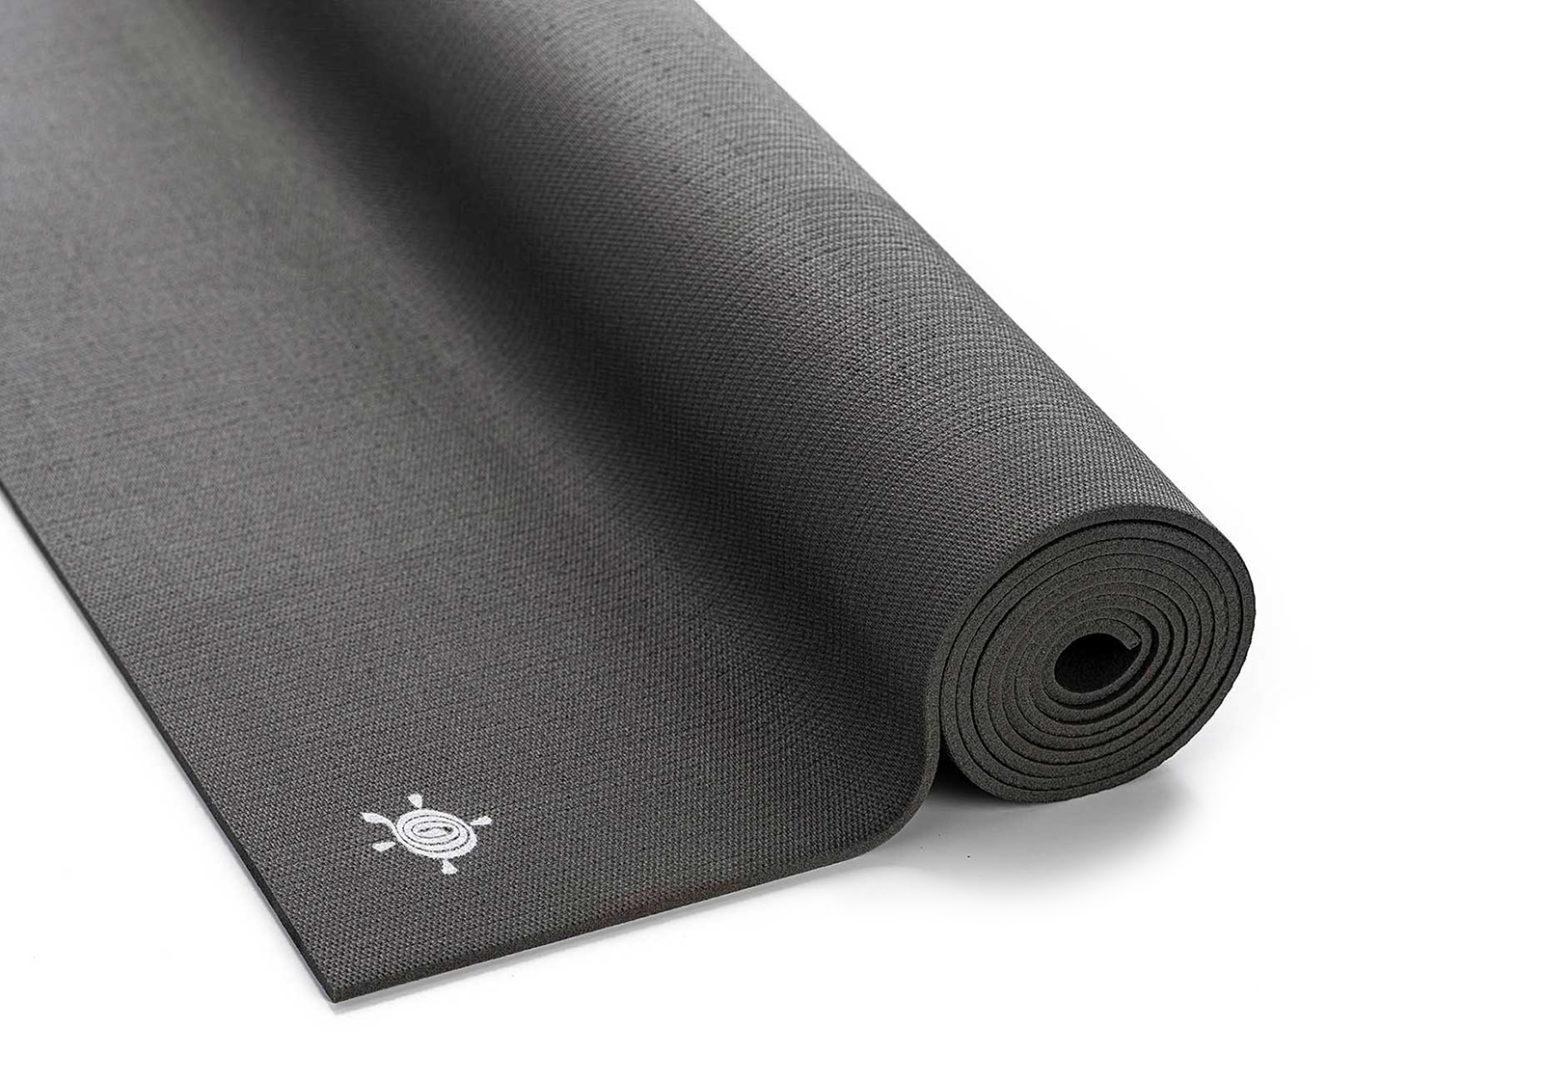 Kurma_yoga_mat_grip-lite_anthracite1-1543×1080